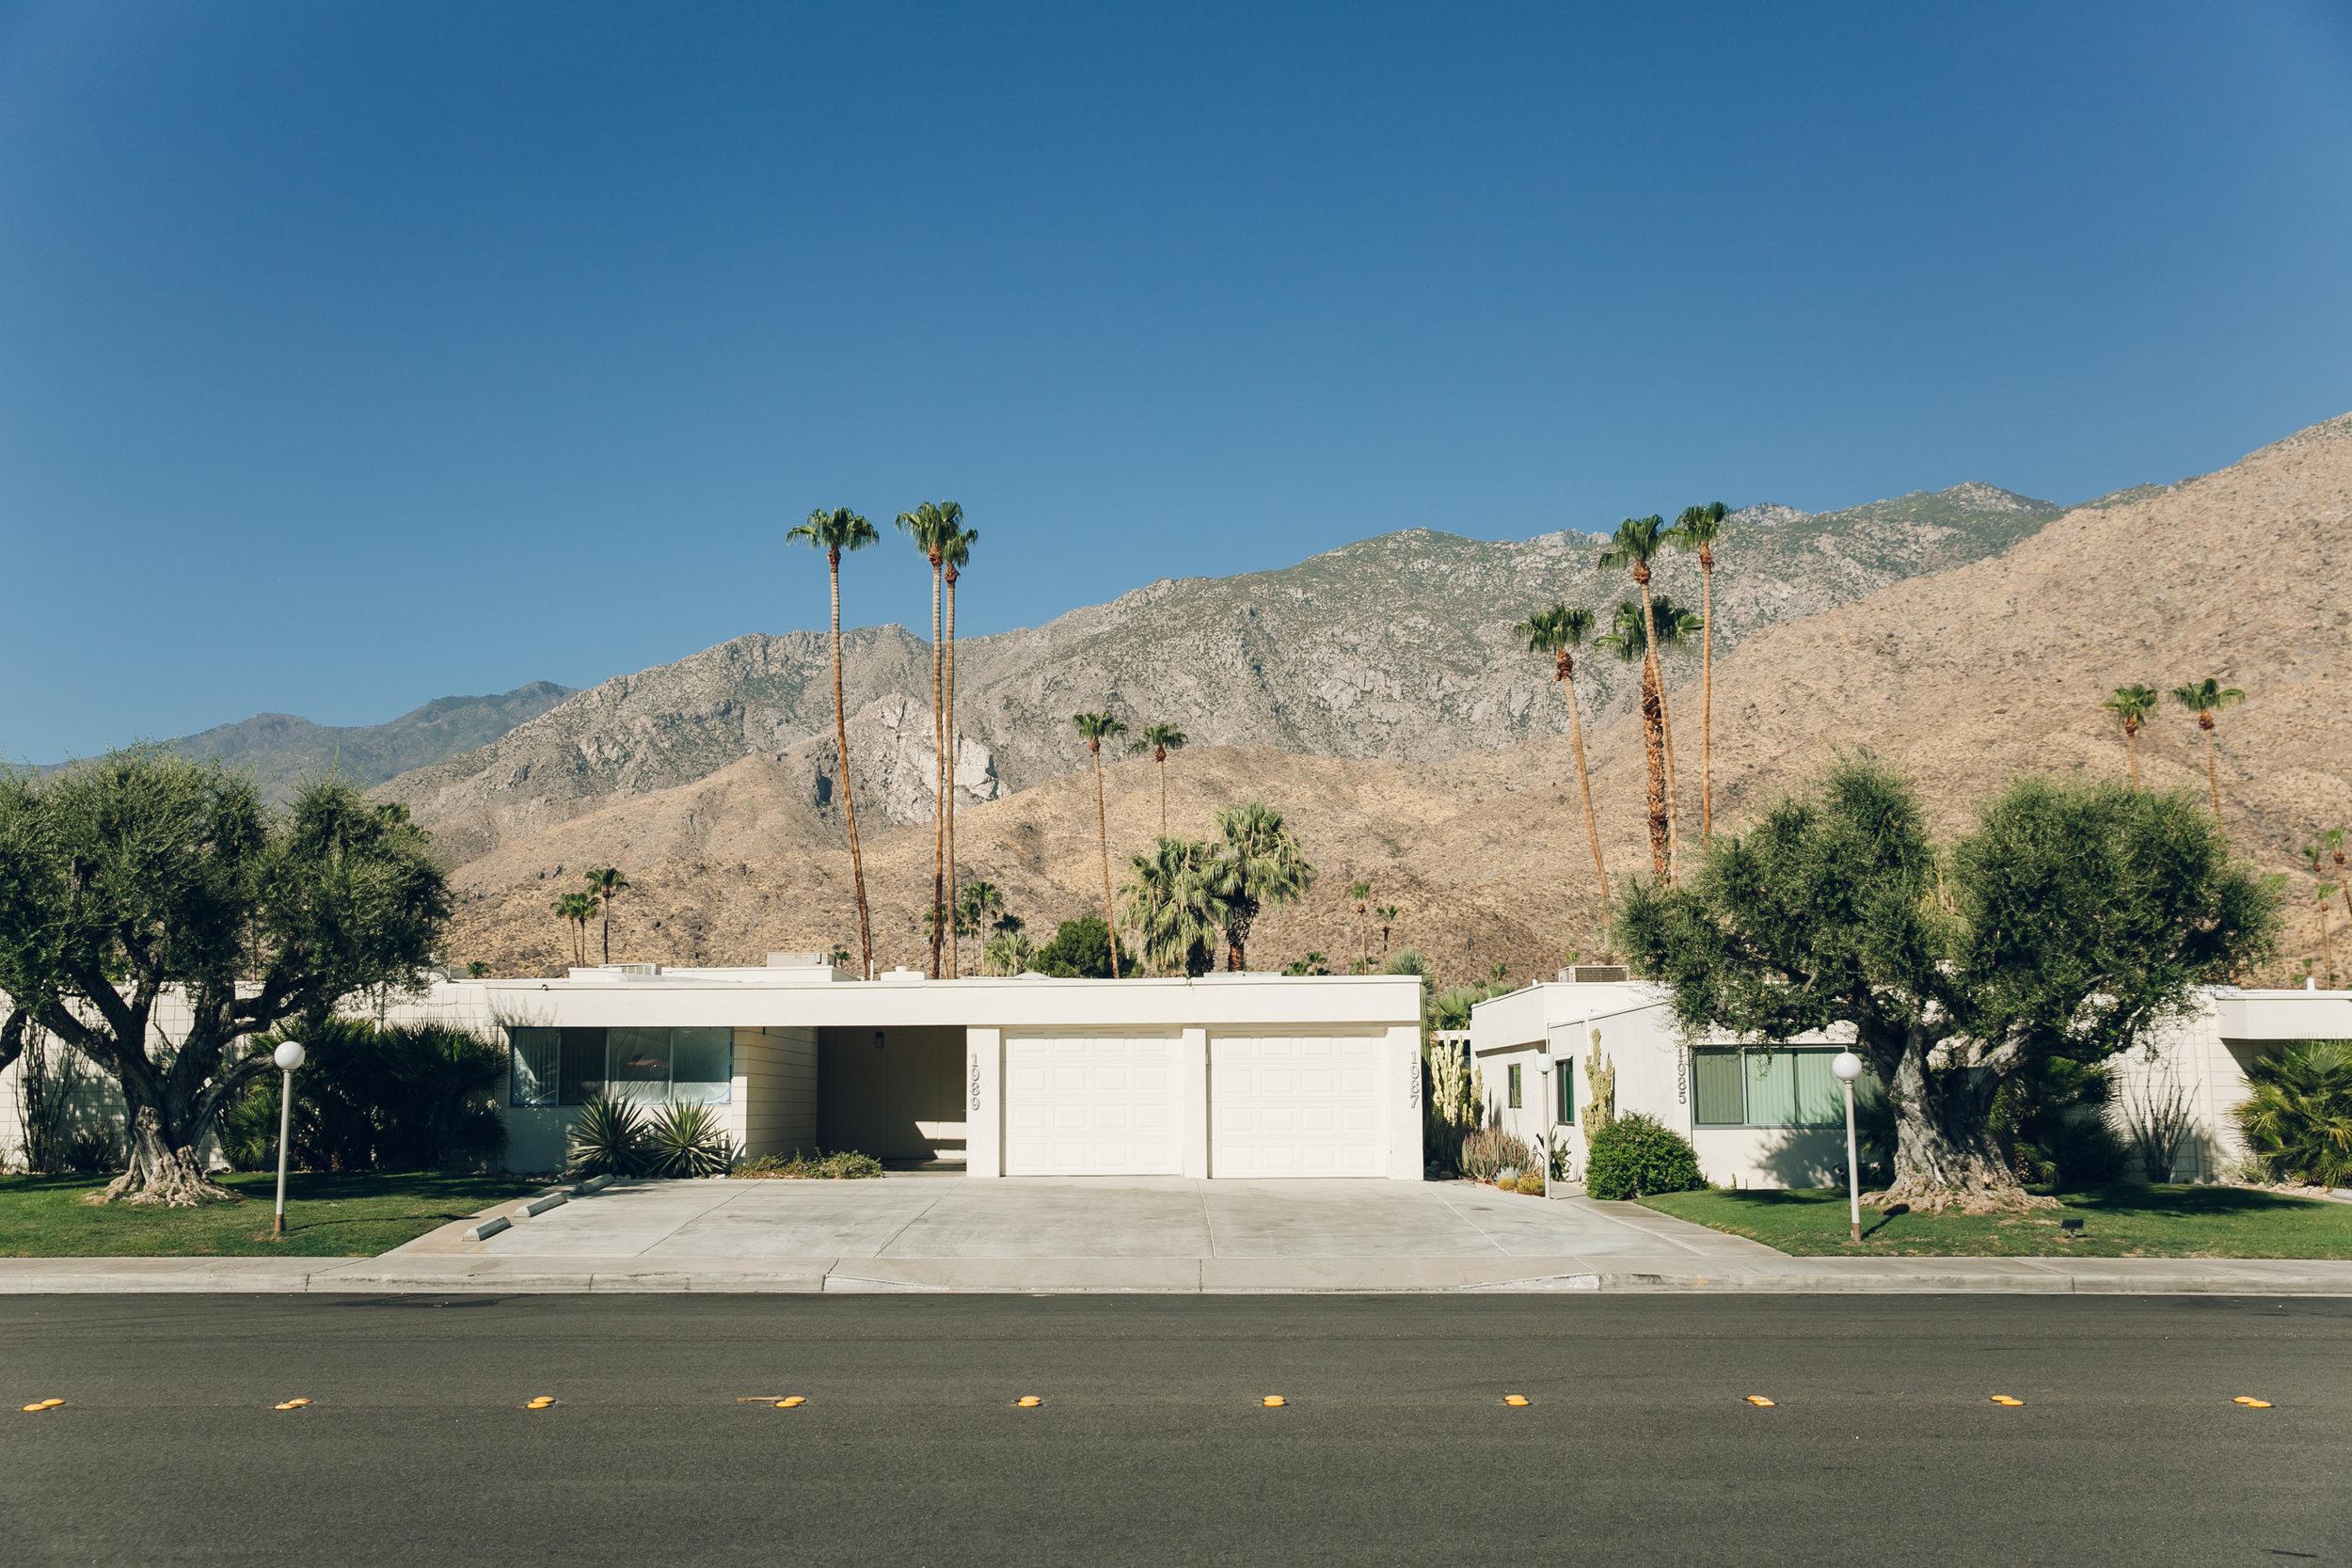 Ace hotel swim club palm springs california haarkon for Plush pad palm springs